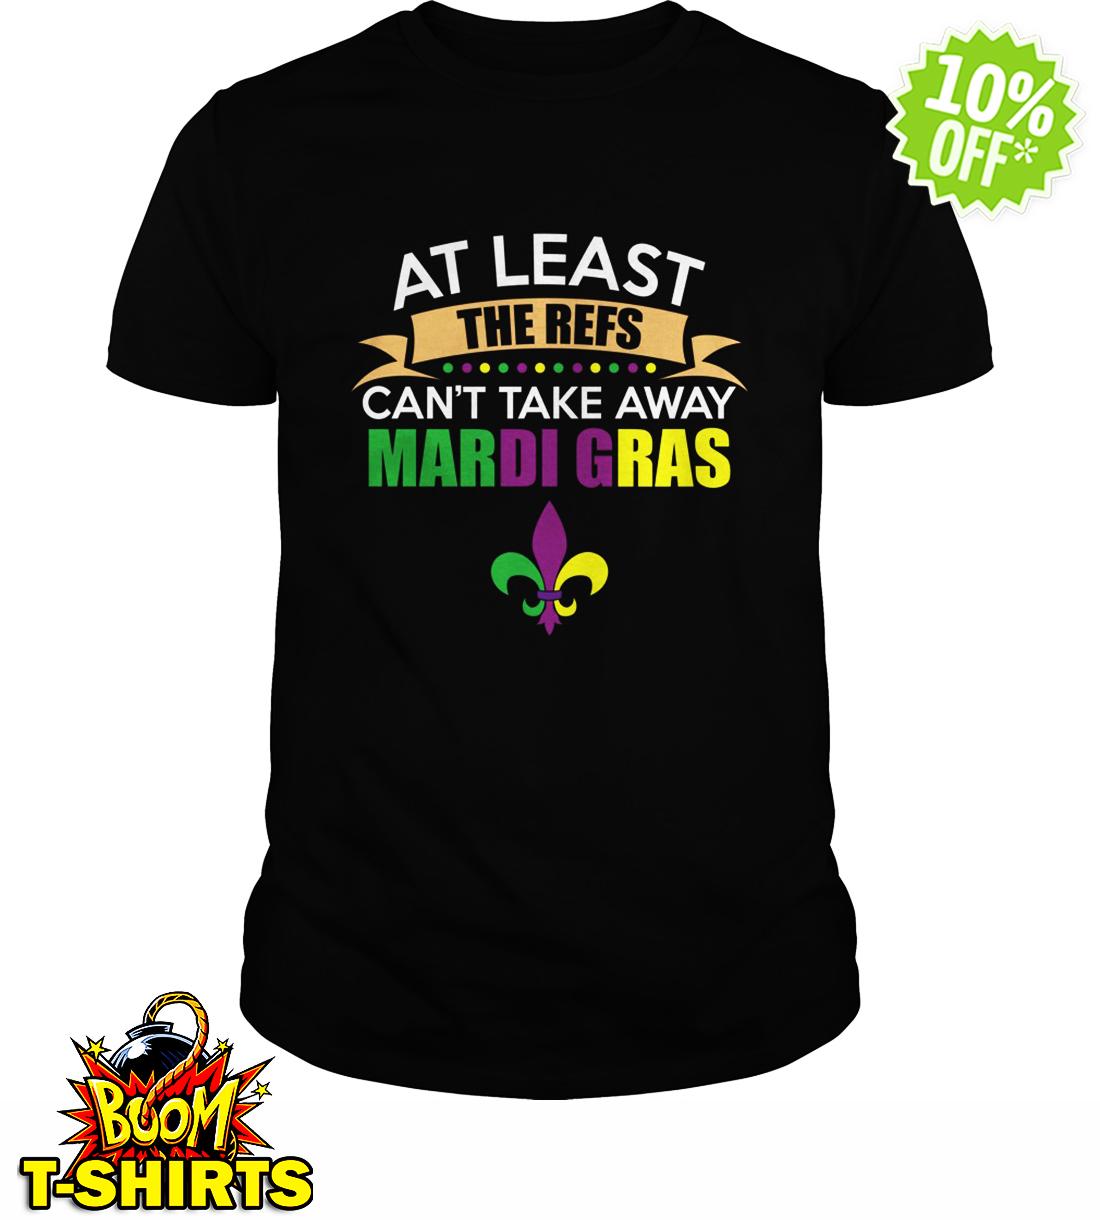 At least the refs cat take away Mardi Gras New Orleans Saints shirt